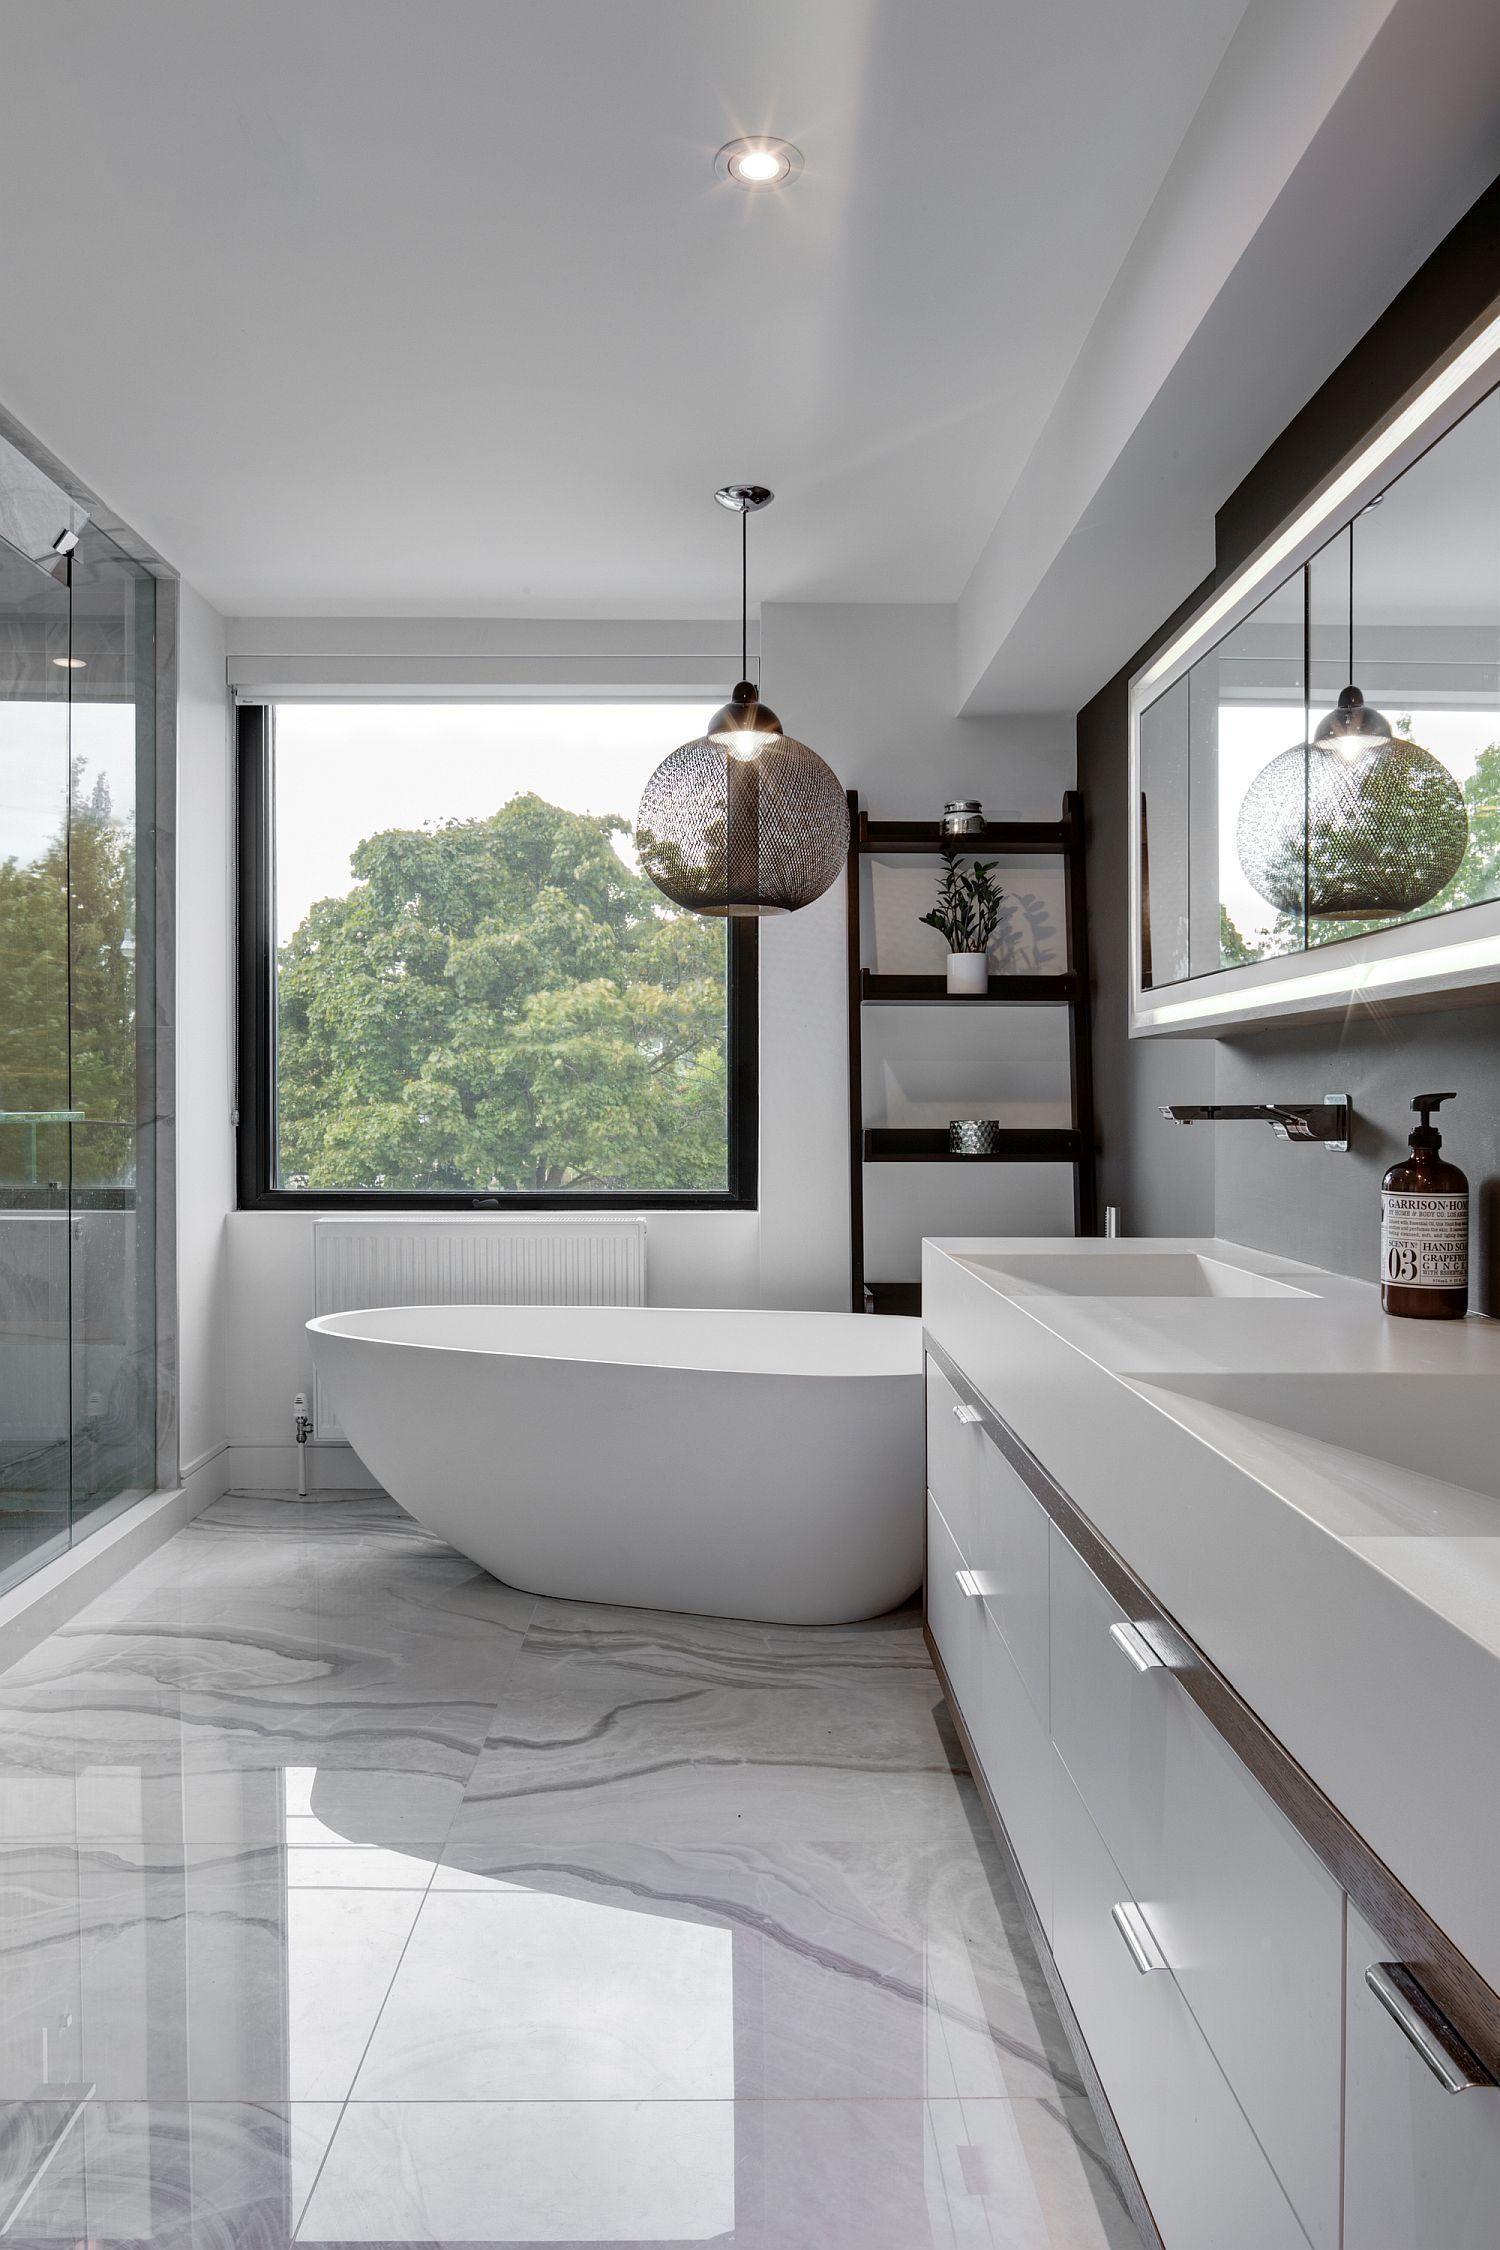 40 Modern Bathroom Design Ideas To Inspire Yourself Modern